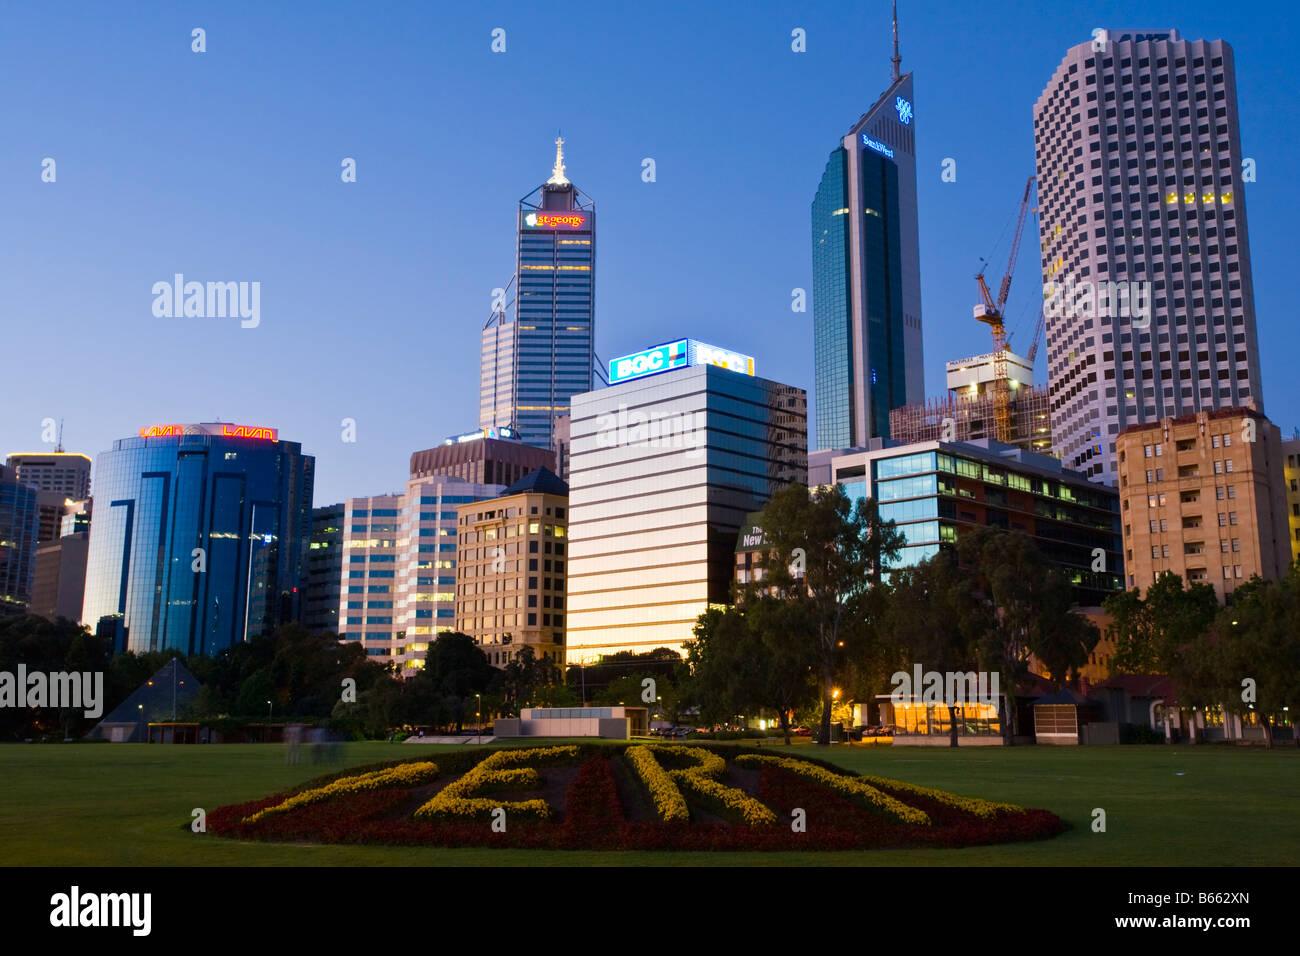 CBD at night Perth Western Australia - Stock Image